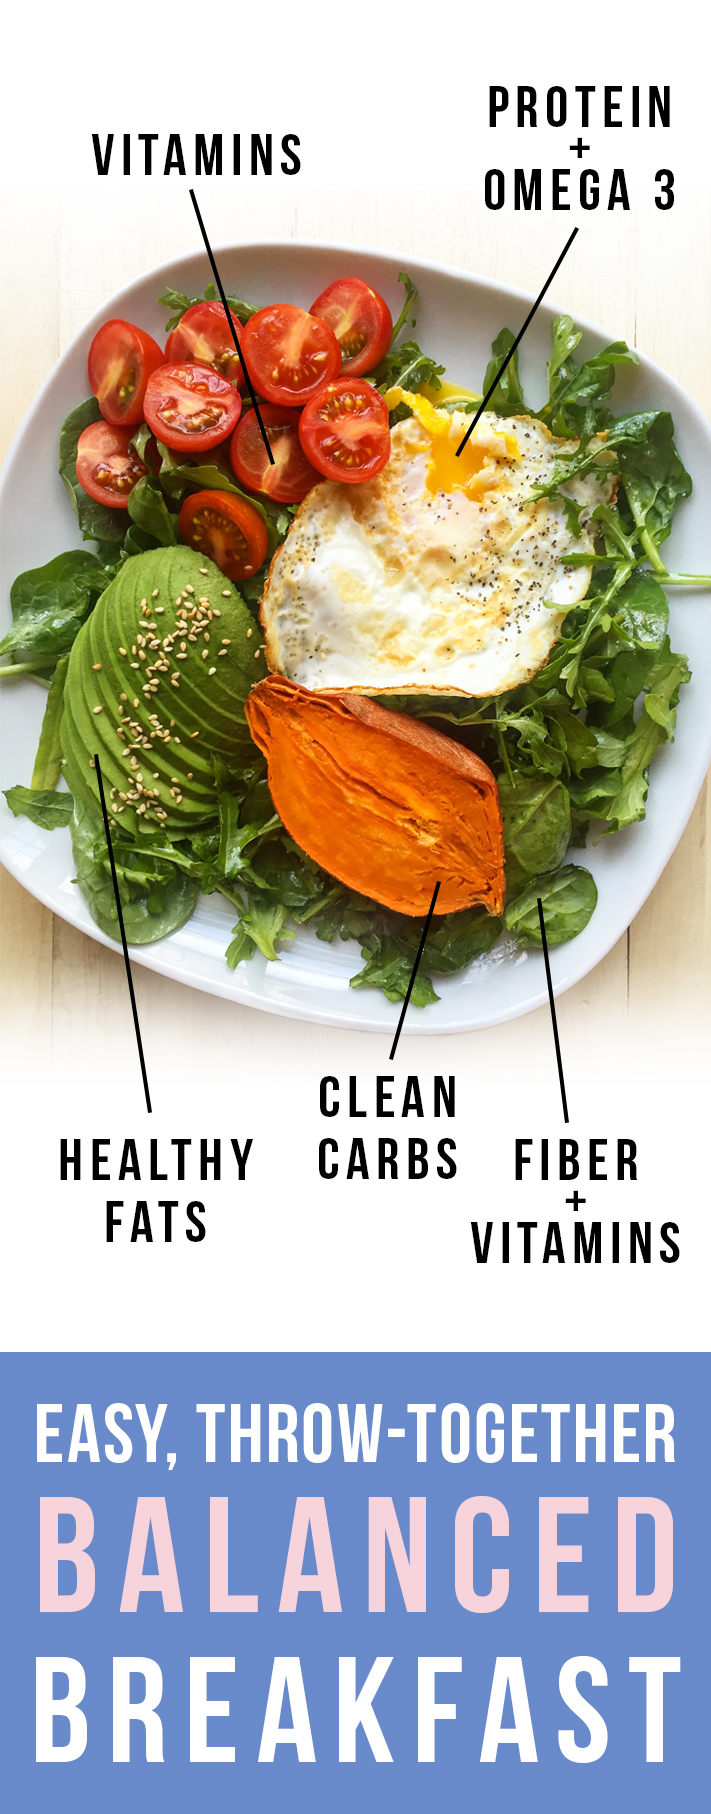 Building a Balanced Breakfast | Fresh Planet Flavor